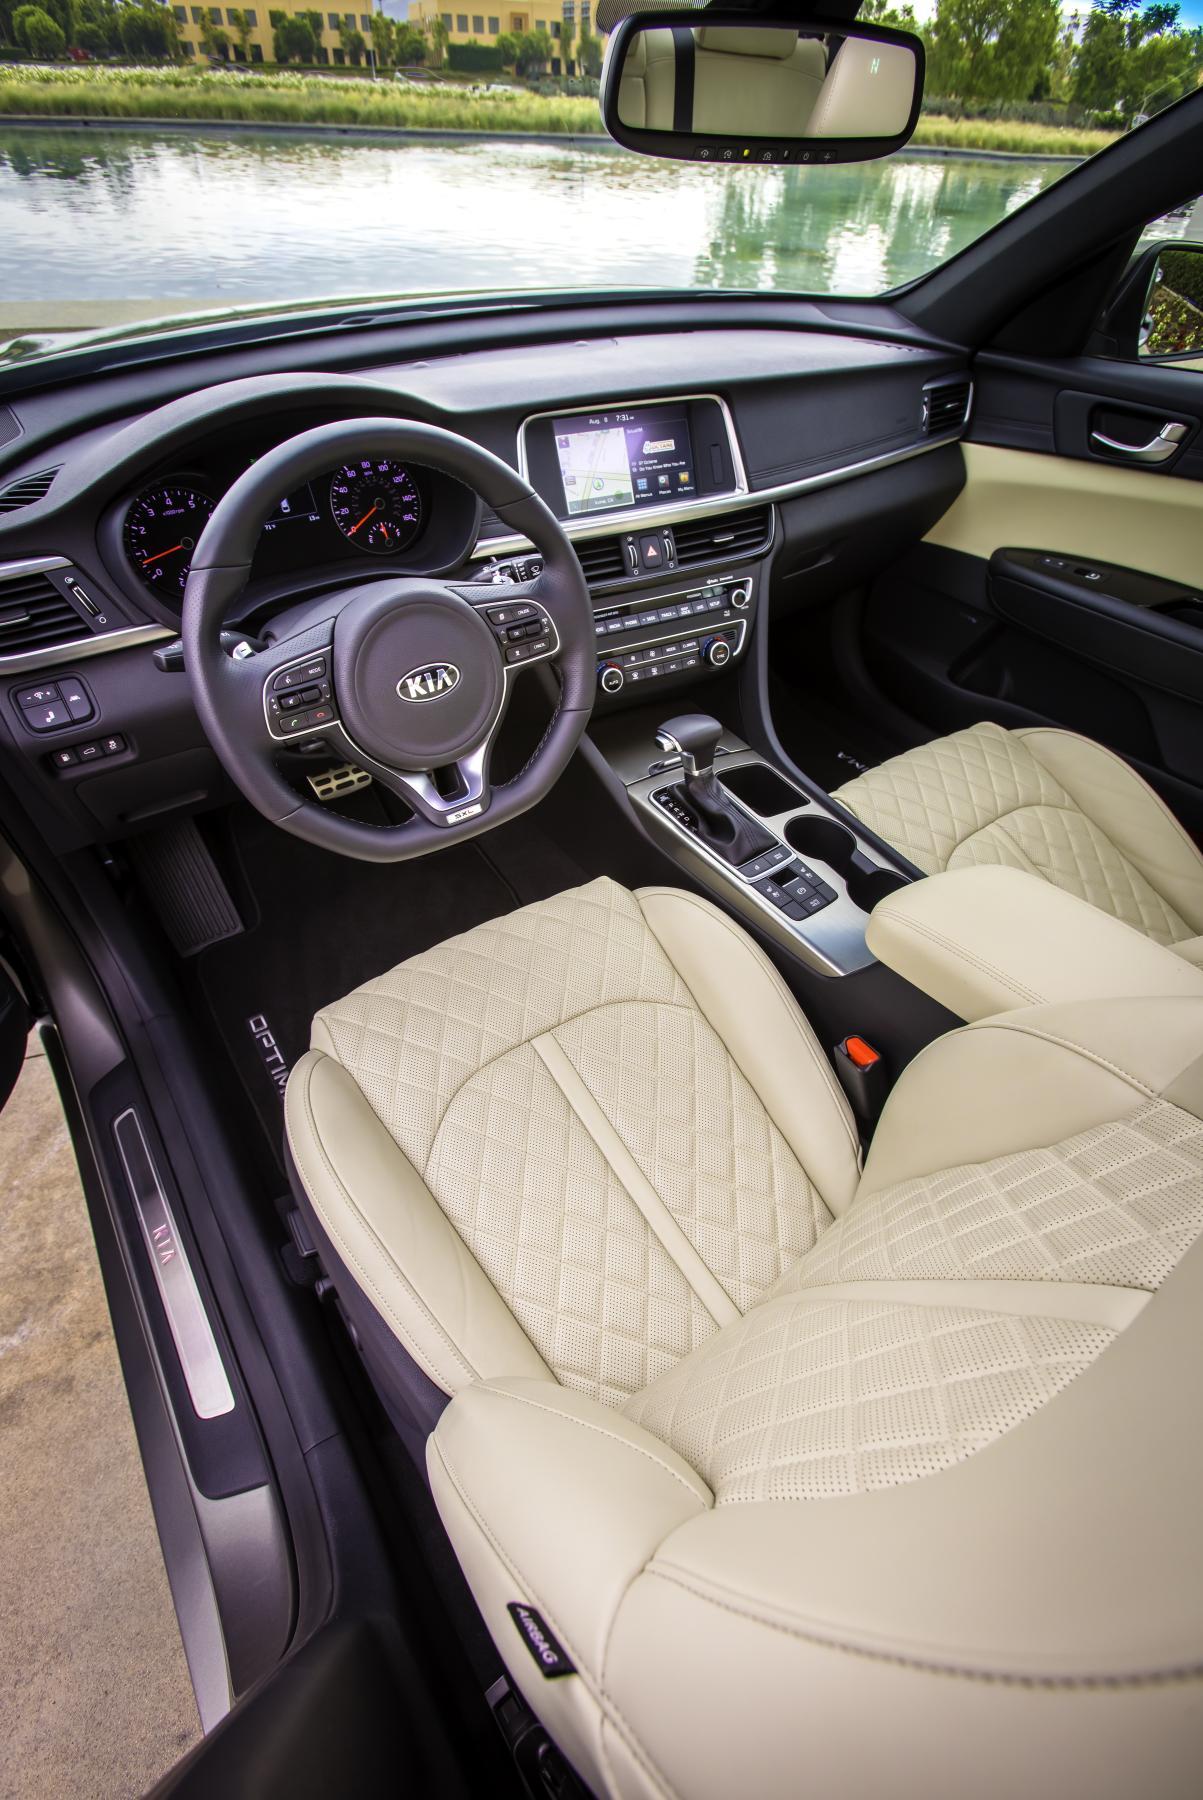 turbo design blog automotive optima sxl sx production post kia ltd